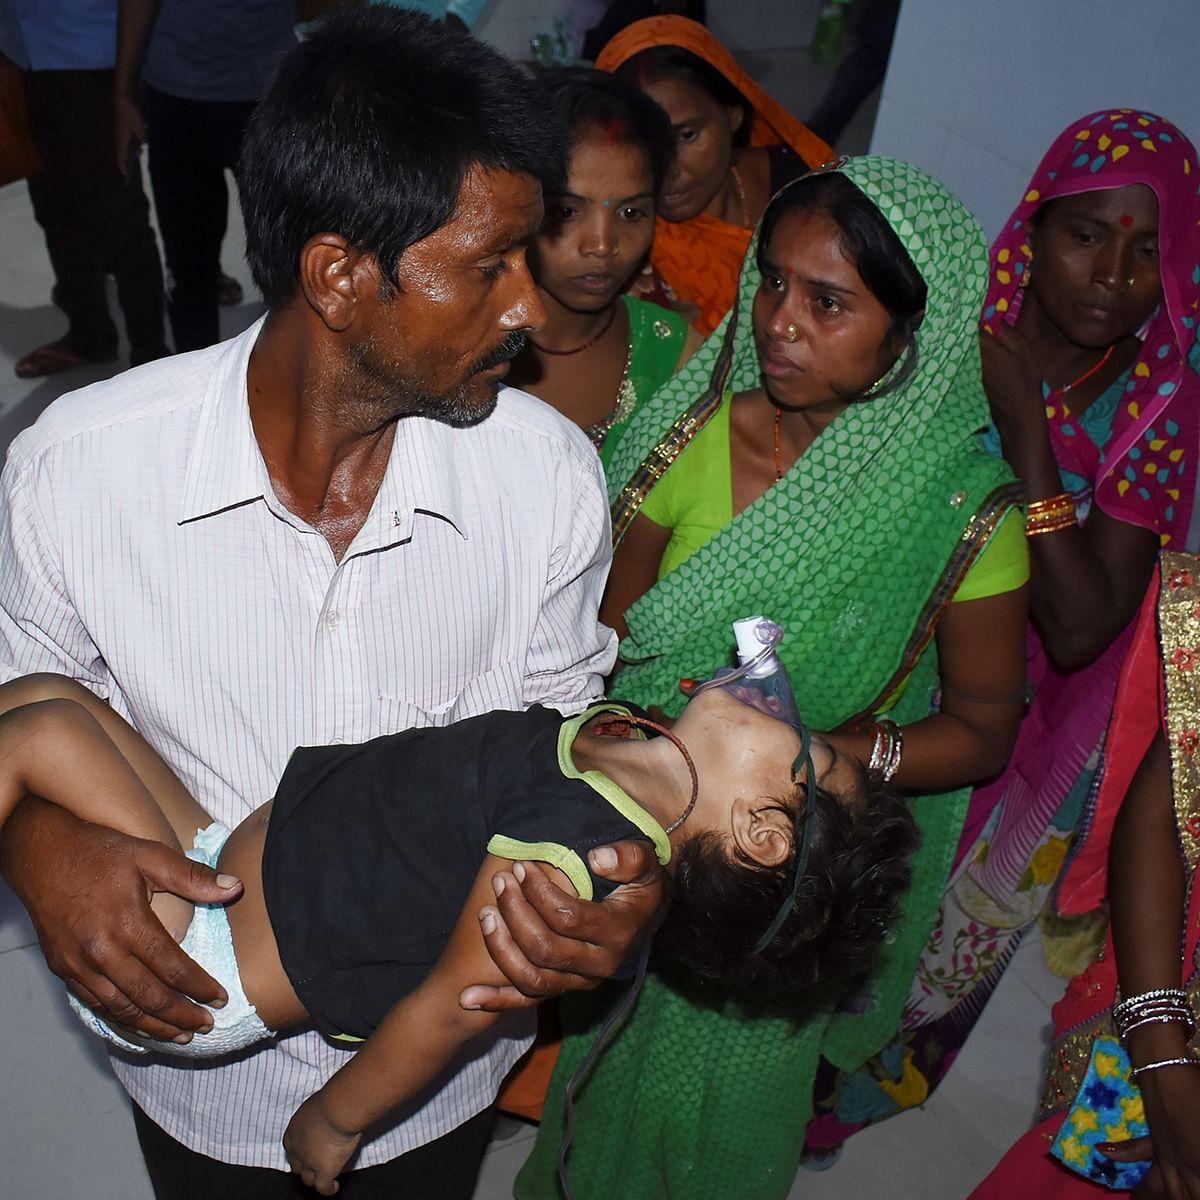 Bihar: Encephalitis death toll rises to 131 in Muzaffarpur